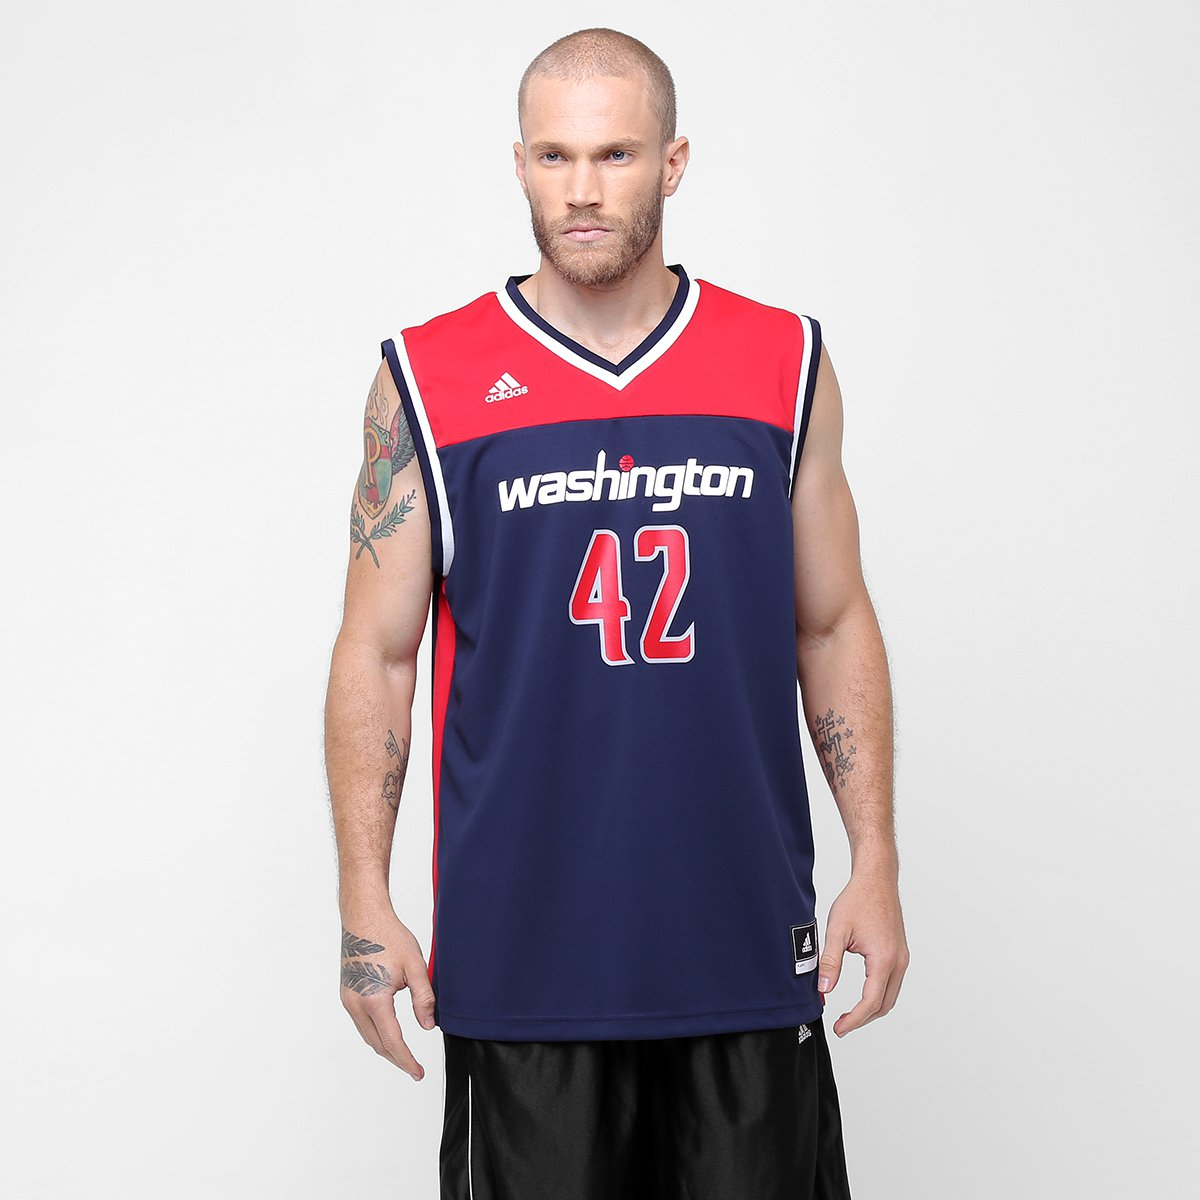 1b60b3761 Camiseta Regata Adidas NBA Washington Wizards - Nene - Compre Agora ...